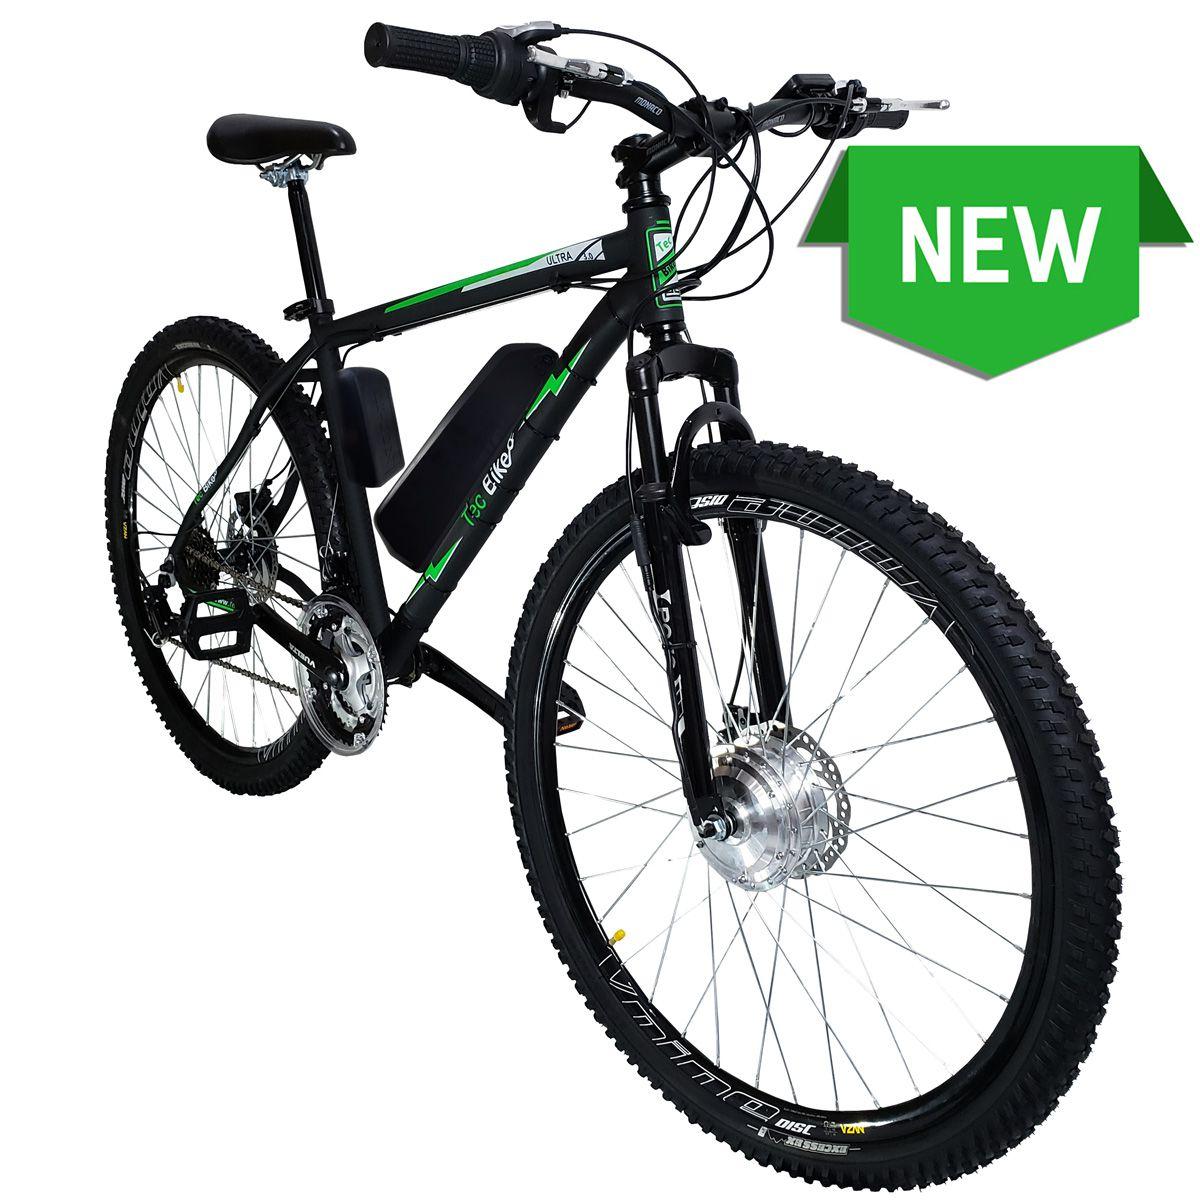 Bicicleta Elétrica Aro 29 Alumínio Bateria de Lítio TecUltra 3.0 - 500 Watts (Mesa Regulável)